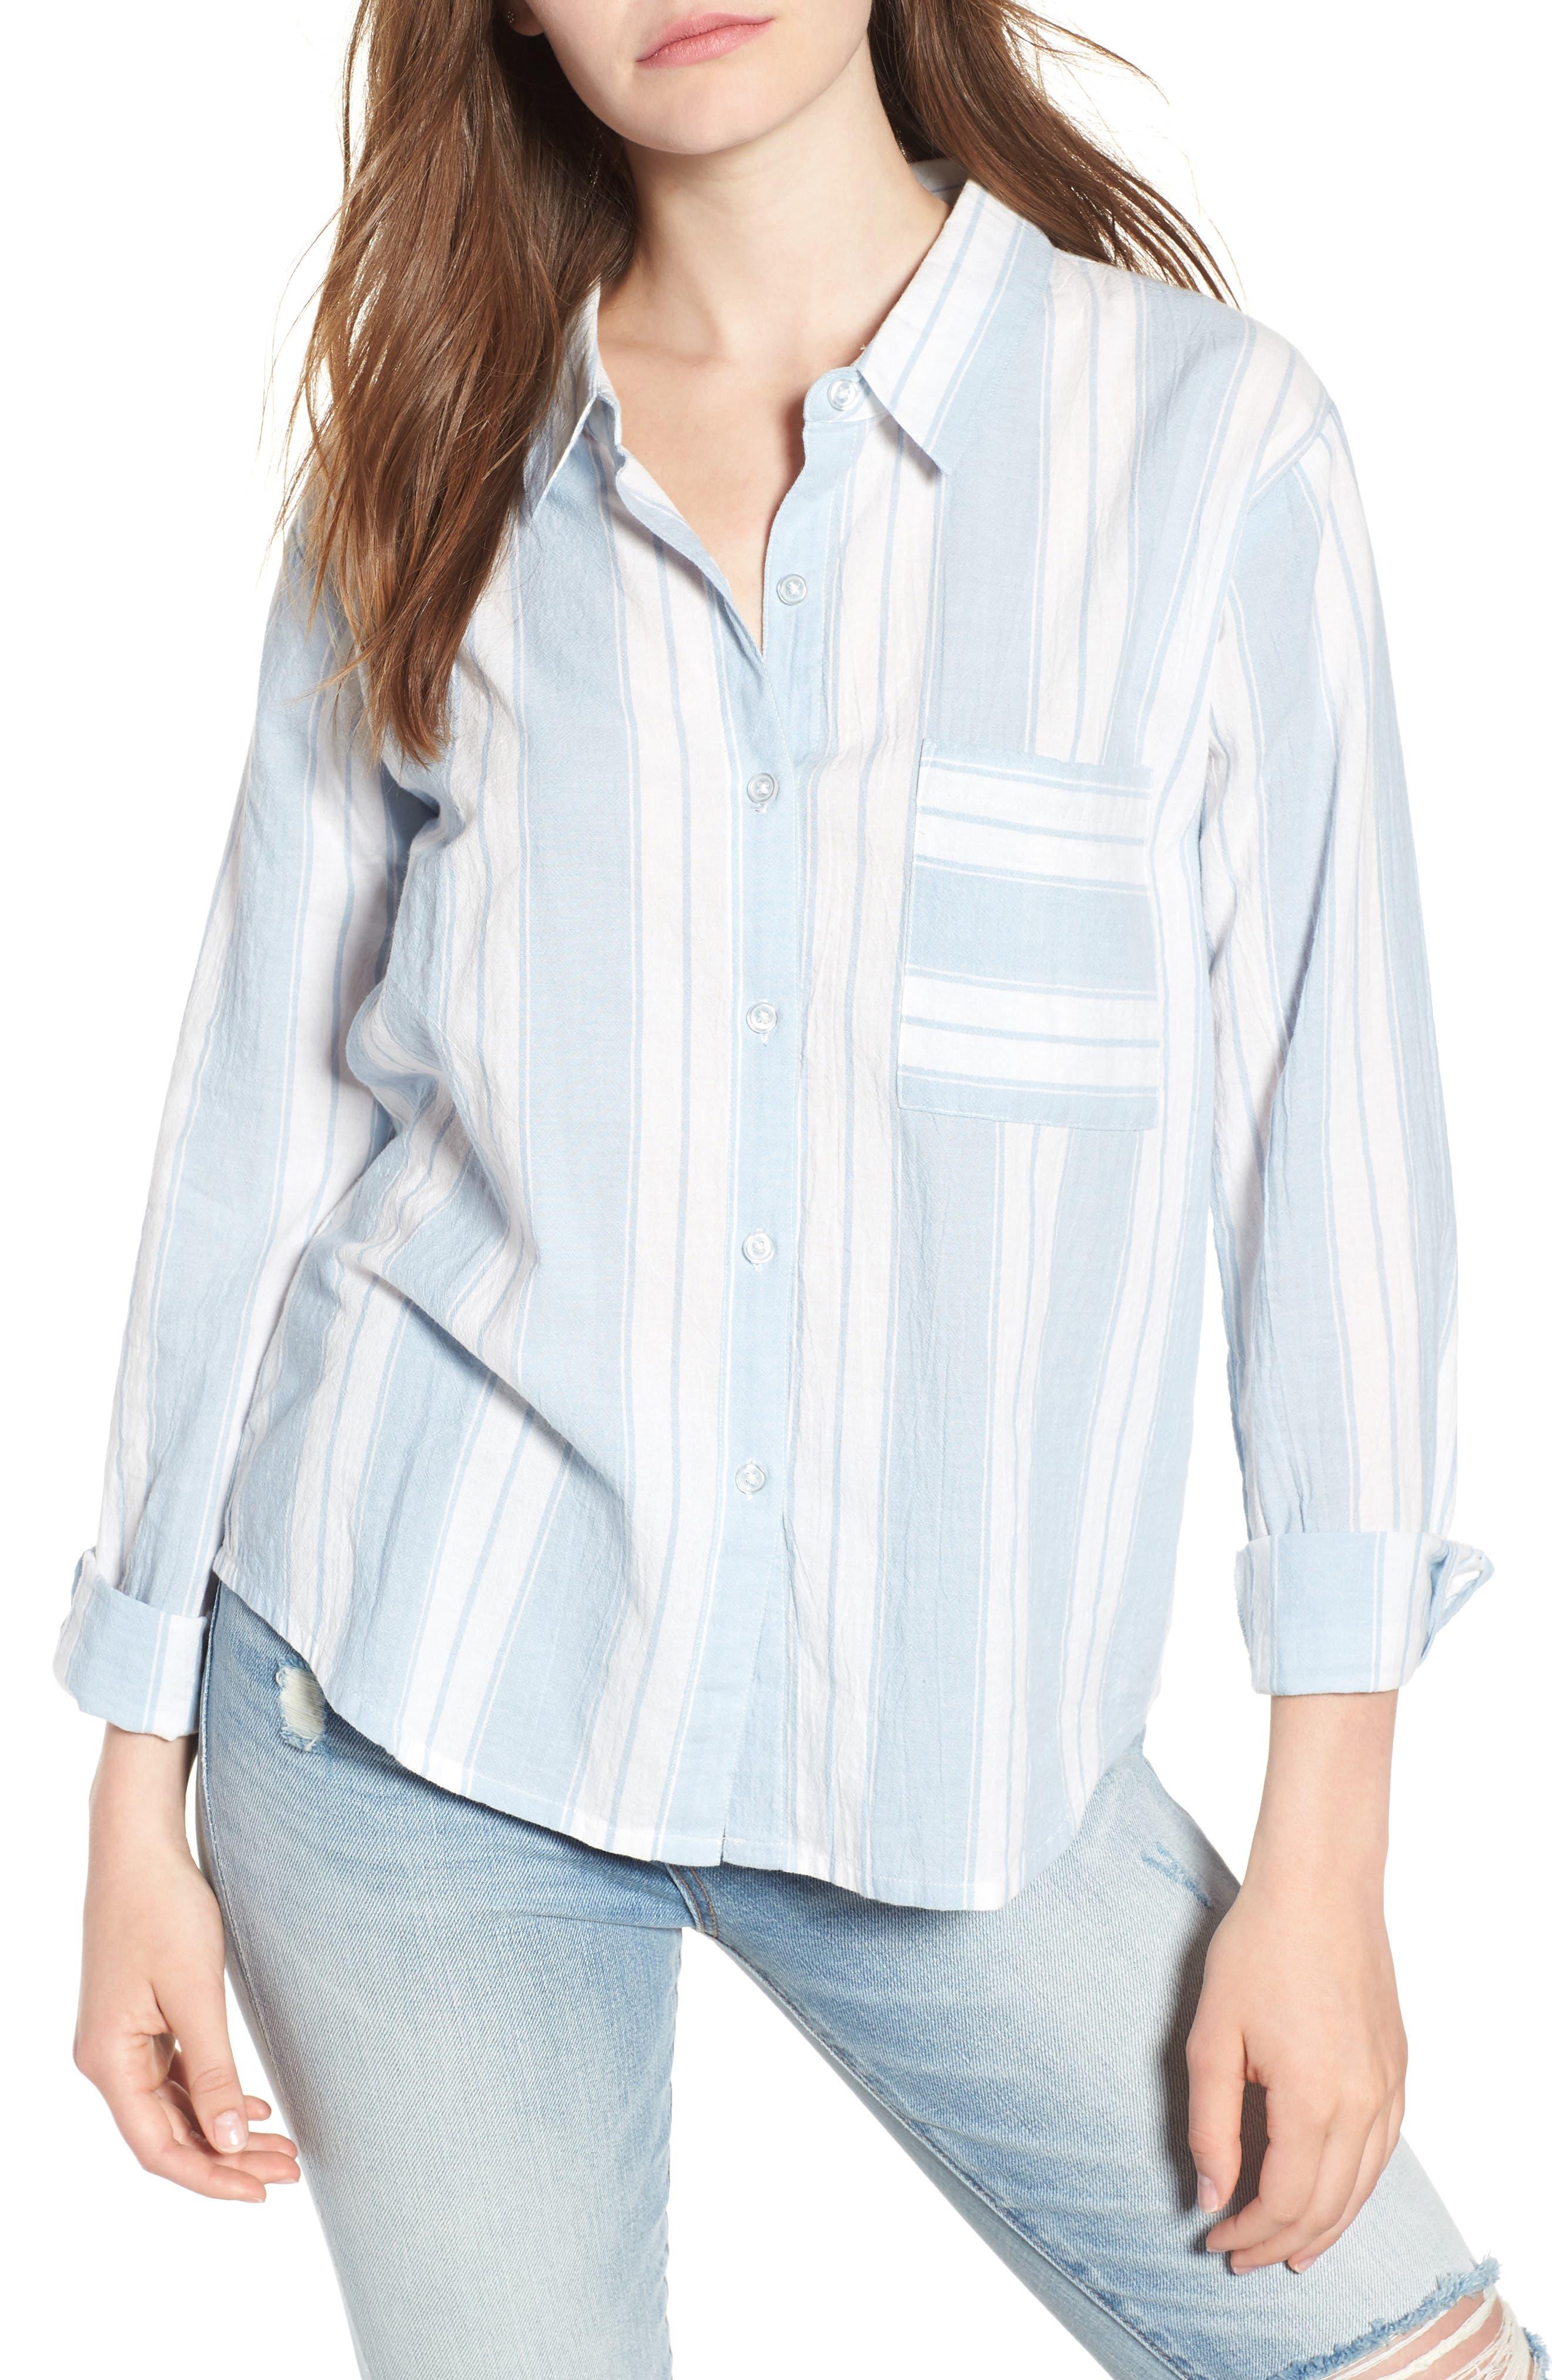 Bleach Stripe Chambray Top,                         Main,                         color, Blue/ White